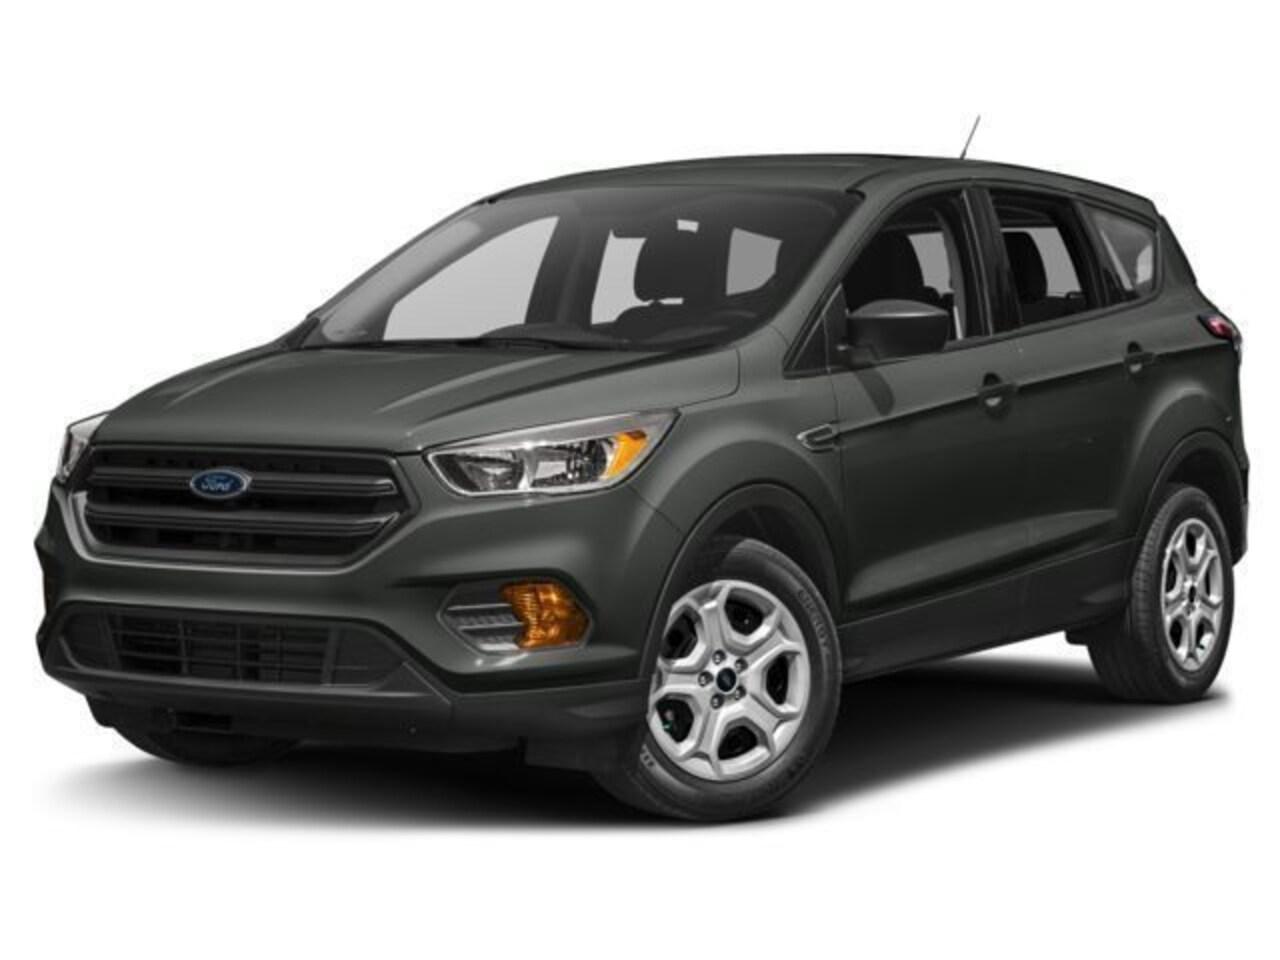 2018 Ford Escape SE 200A 4WD SPORT NAV SYNC PKG SUV